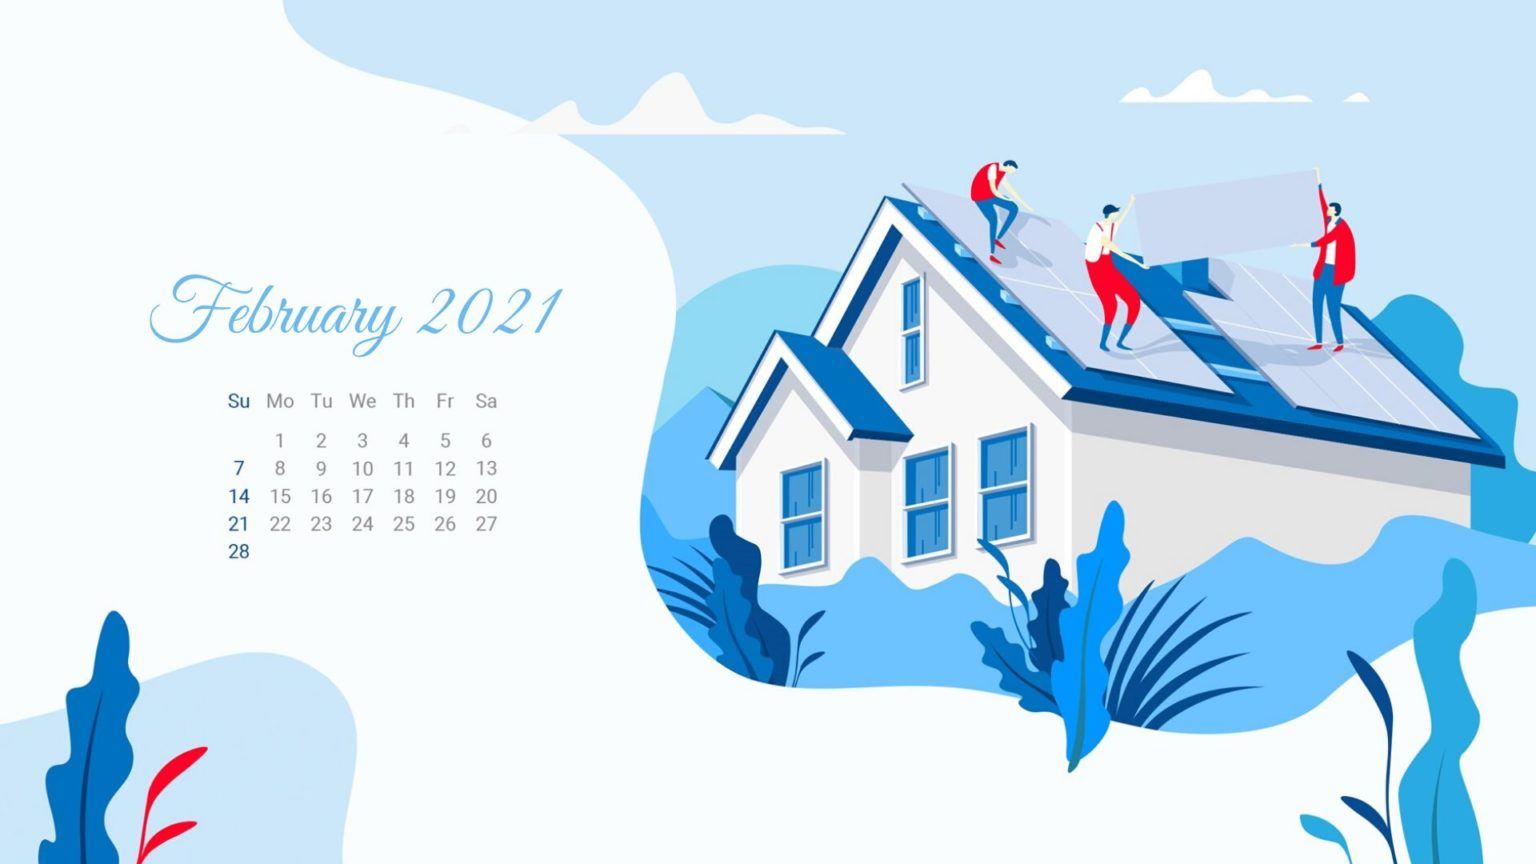 February 2021 Calendar Wallpaper Download